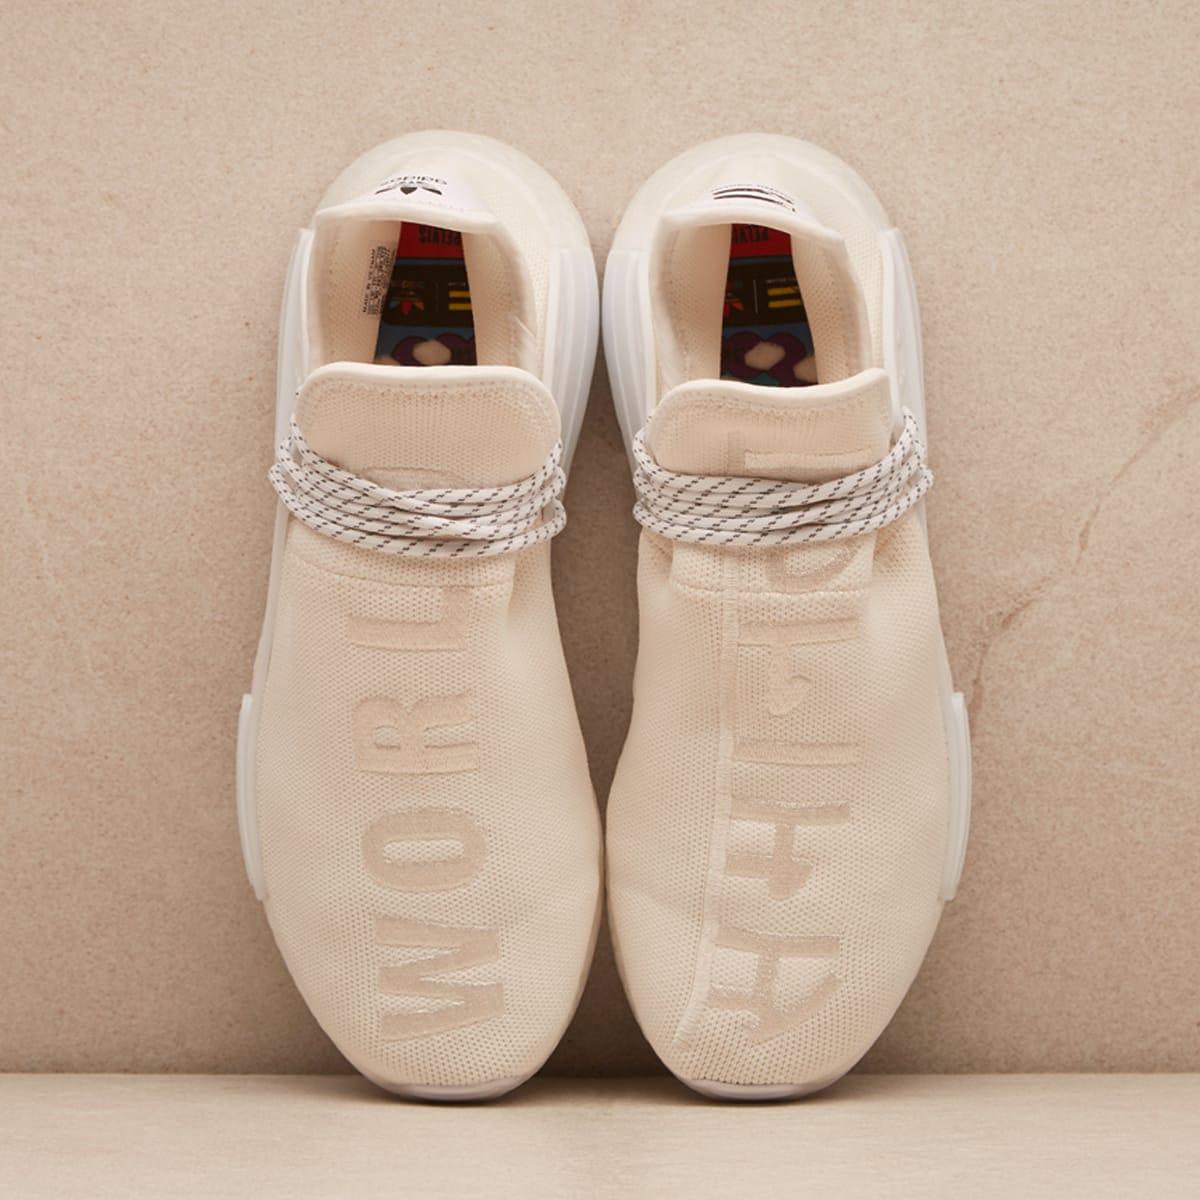 release date a7479 b0d4d Adidas x Pharrell Williams HU Holi NMD (Cream & White)